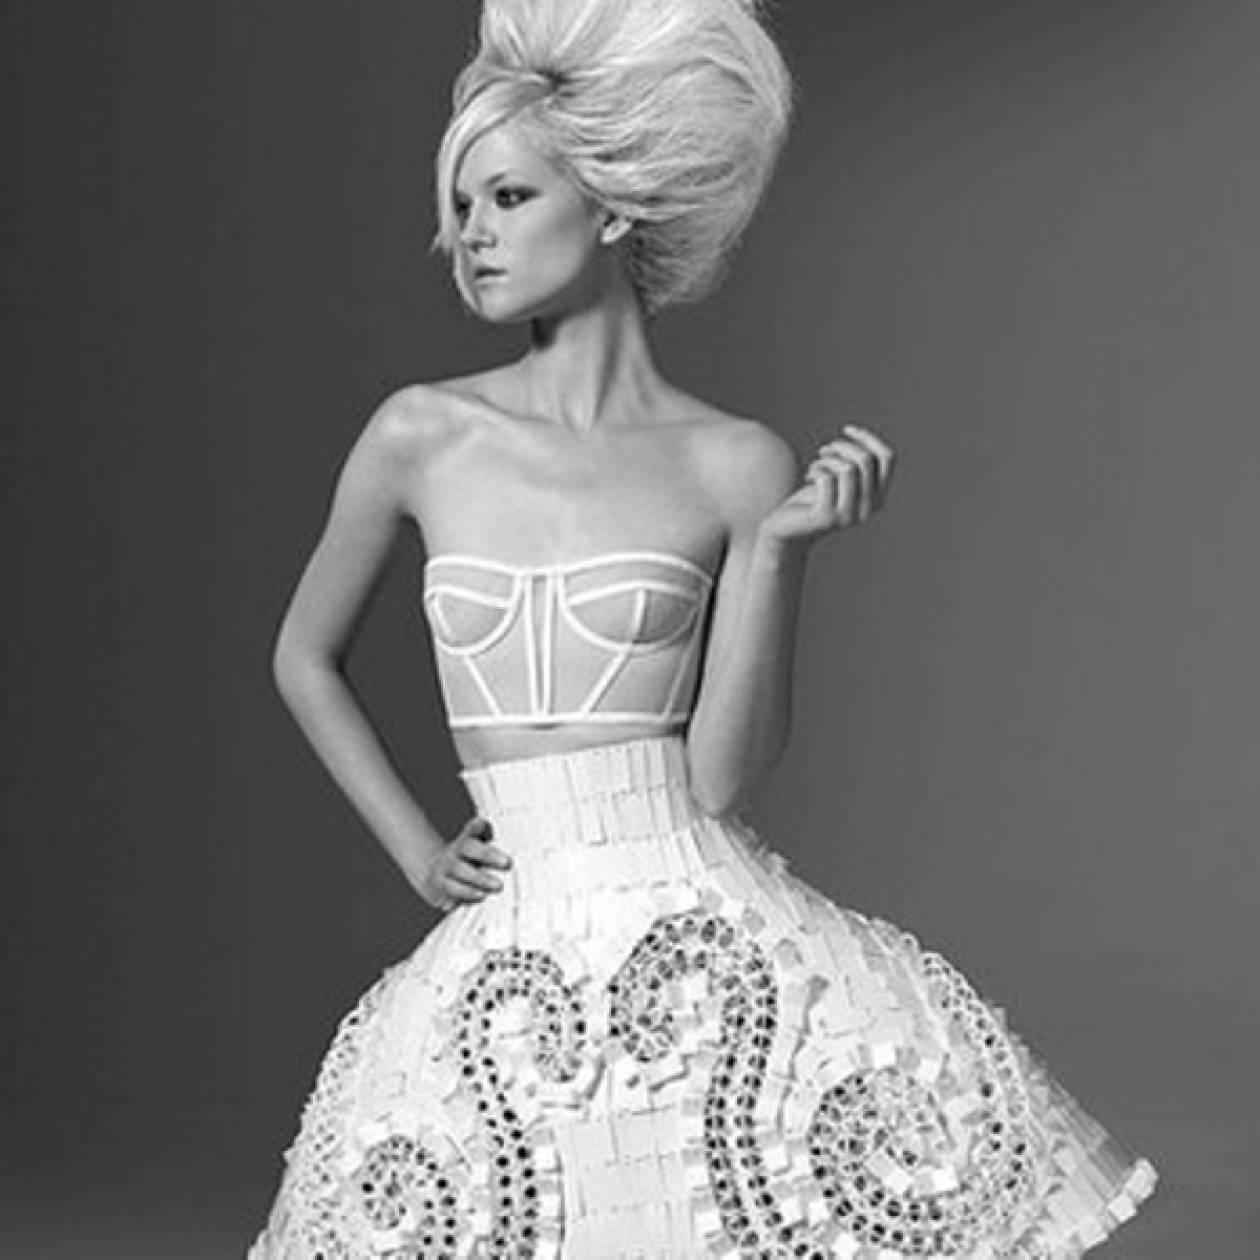 H επιστροφή του οίκου Versace στην υψηλή ραπτική